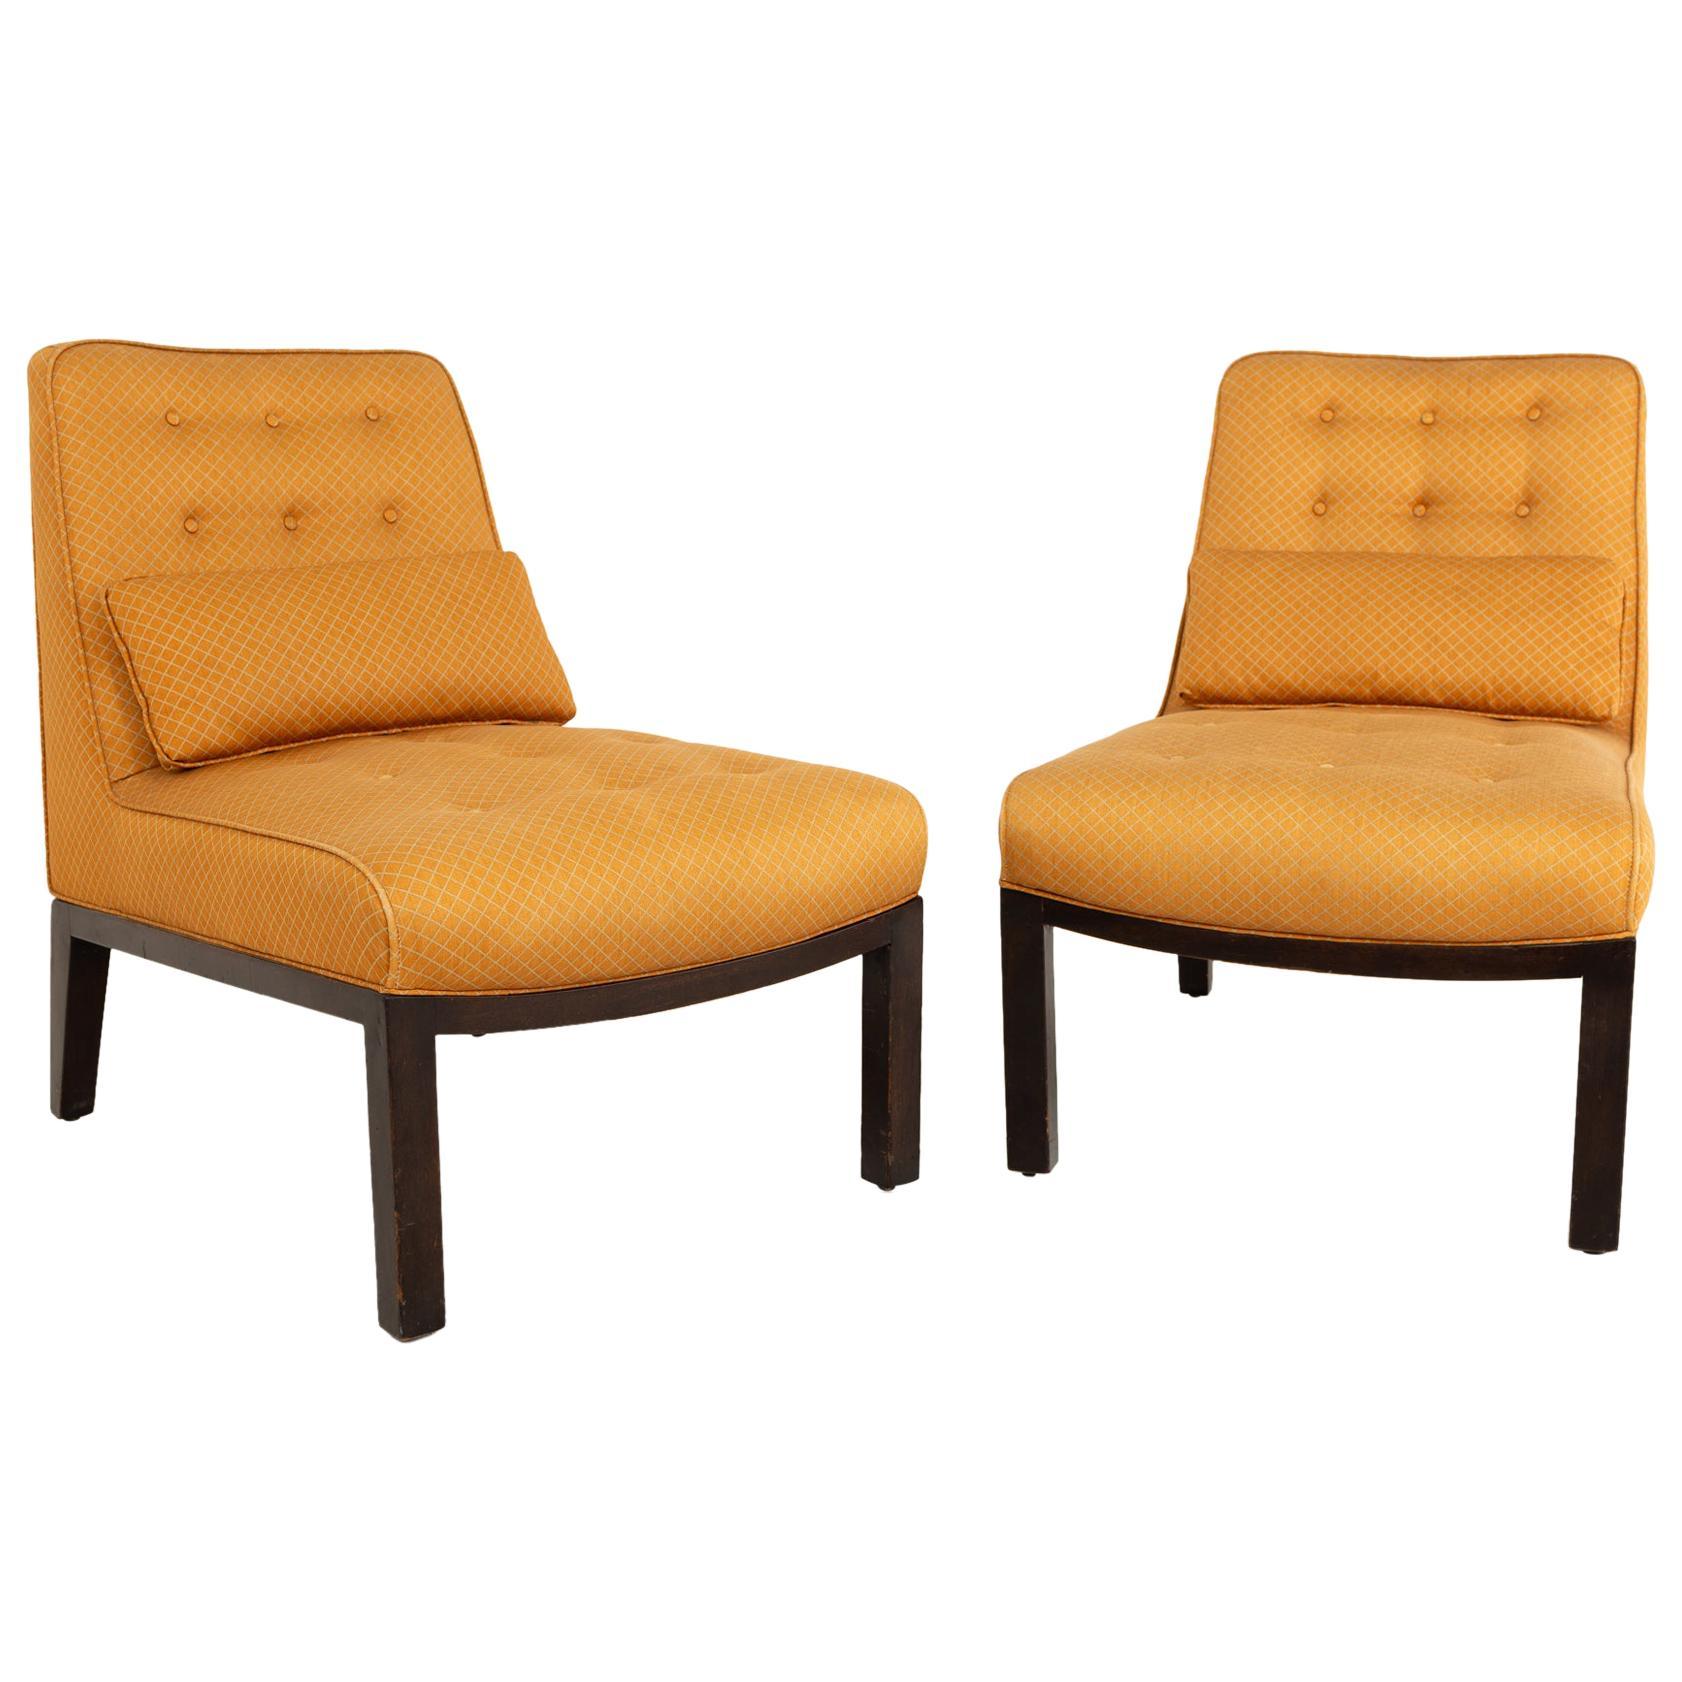 Edward Wormley for Dunbar Mid Century Slipper Lounge Chairs, Pair